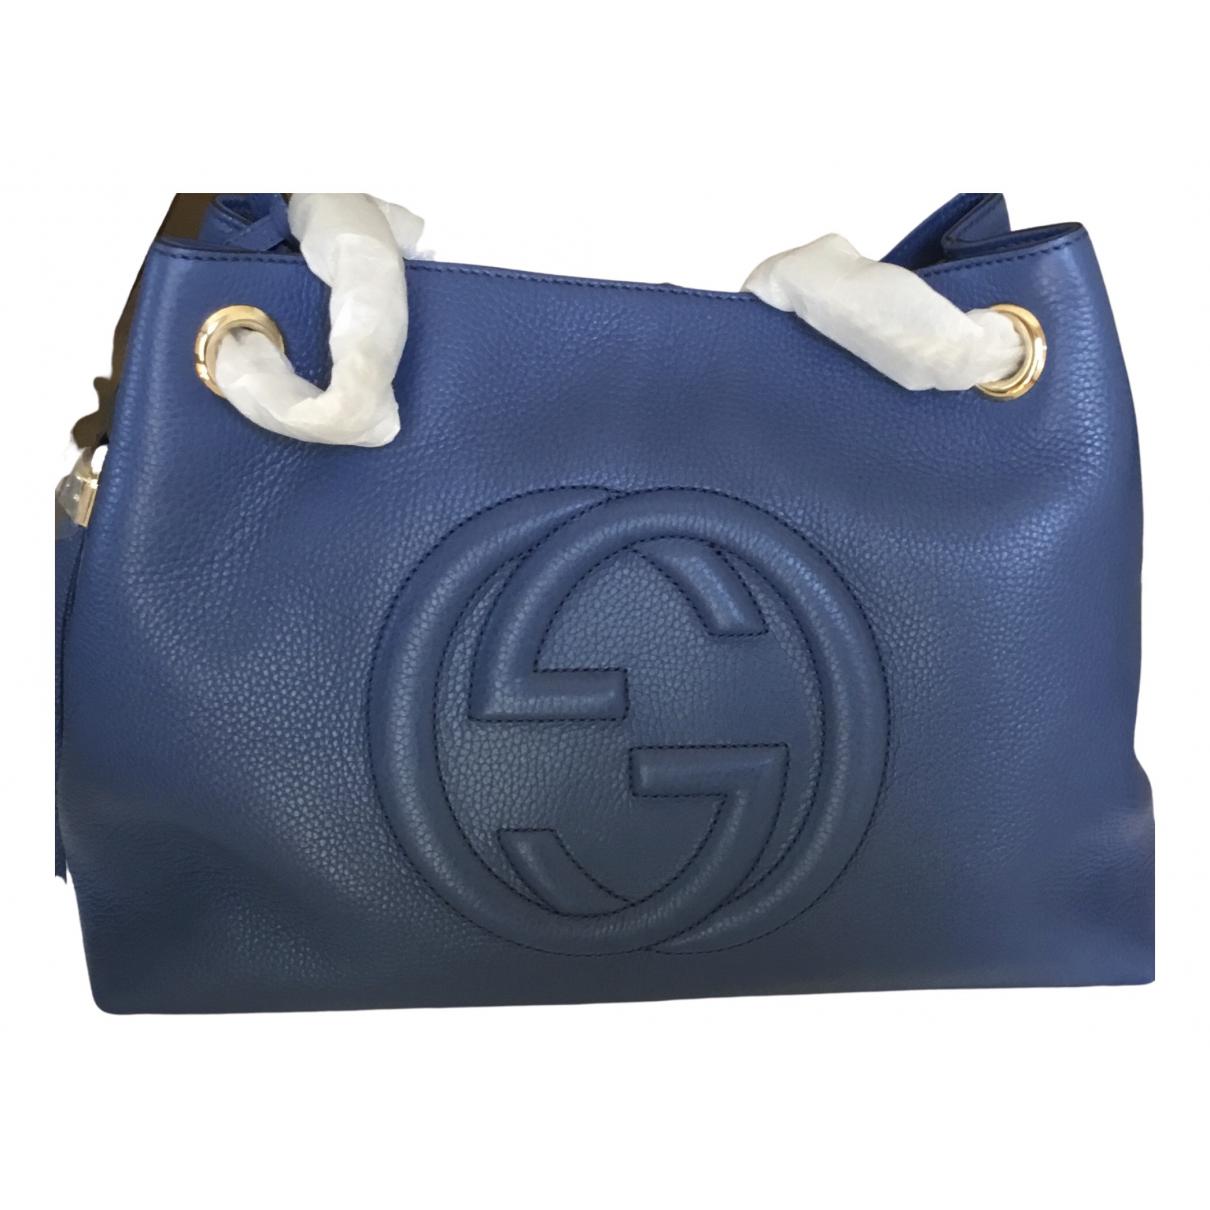 Gucci Soho Blue Leather handbag for Women \N